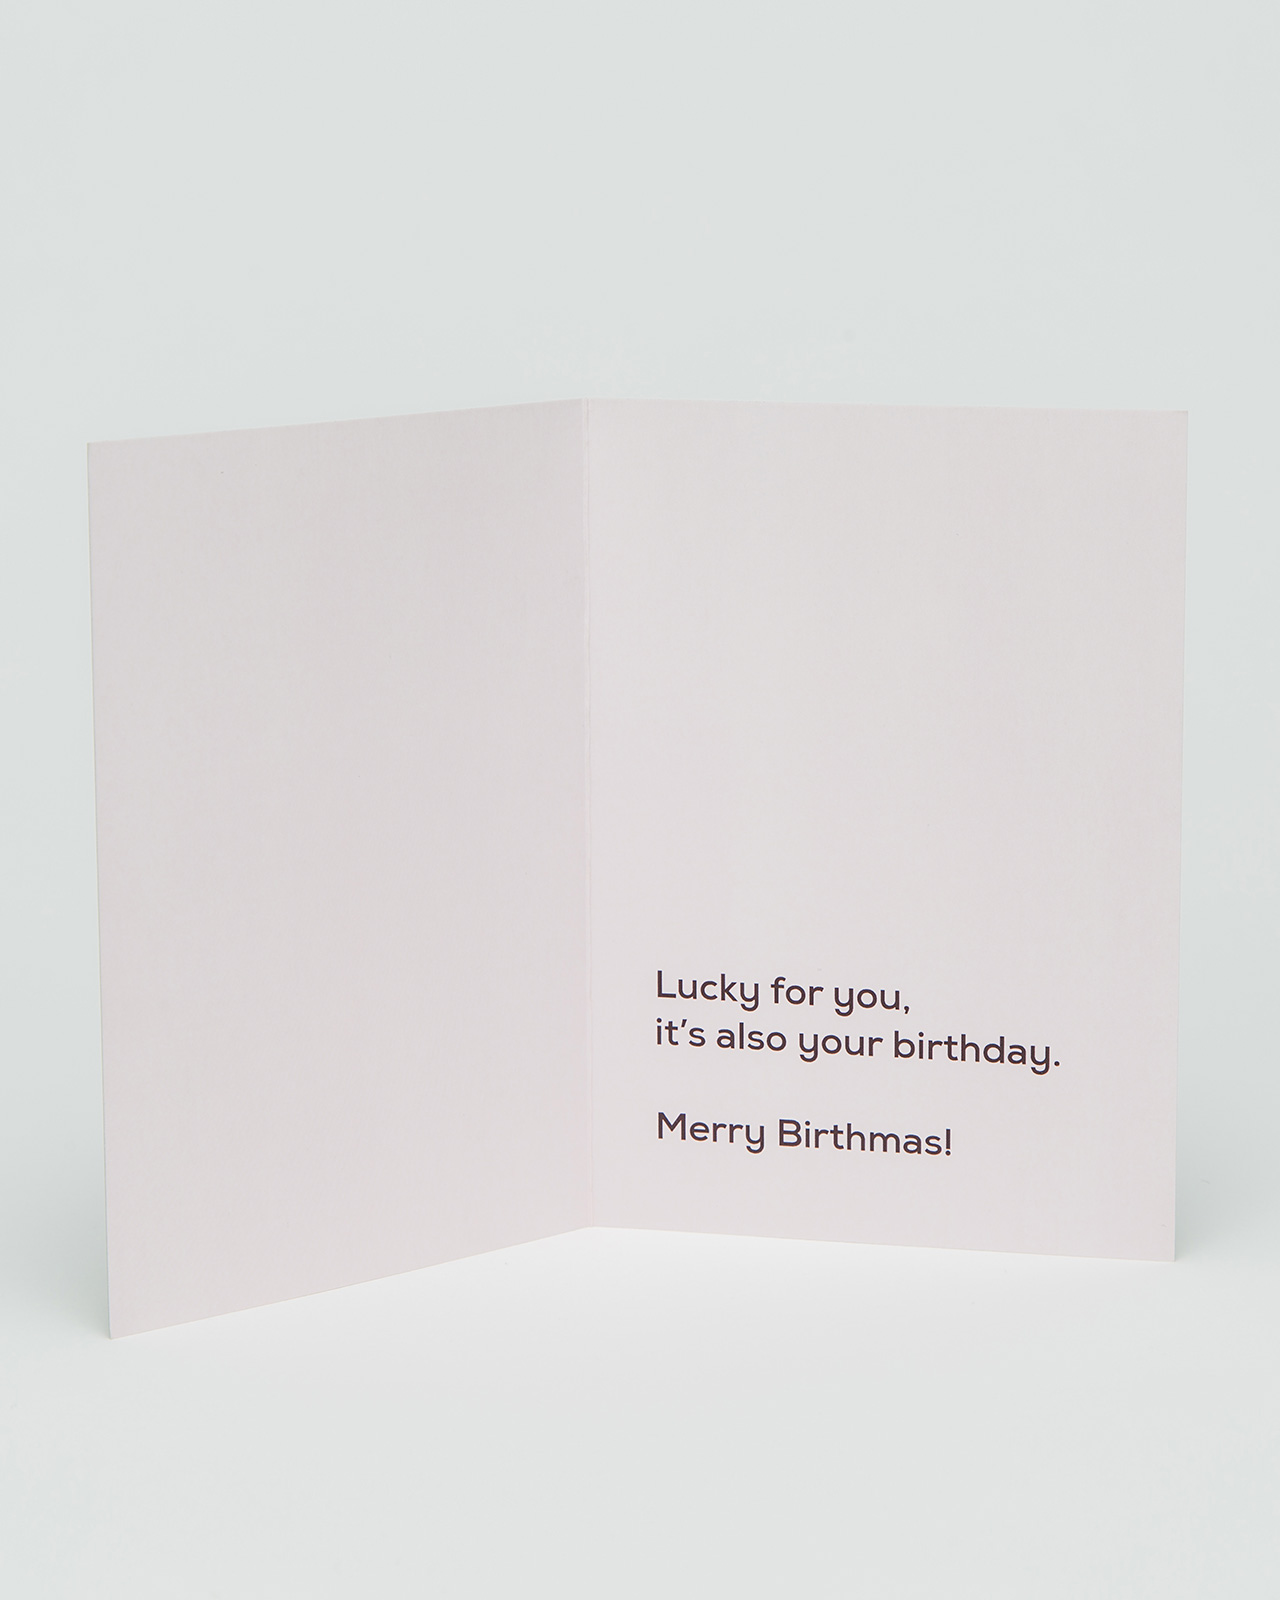 merry-birthmas-6